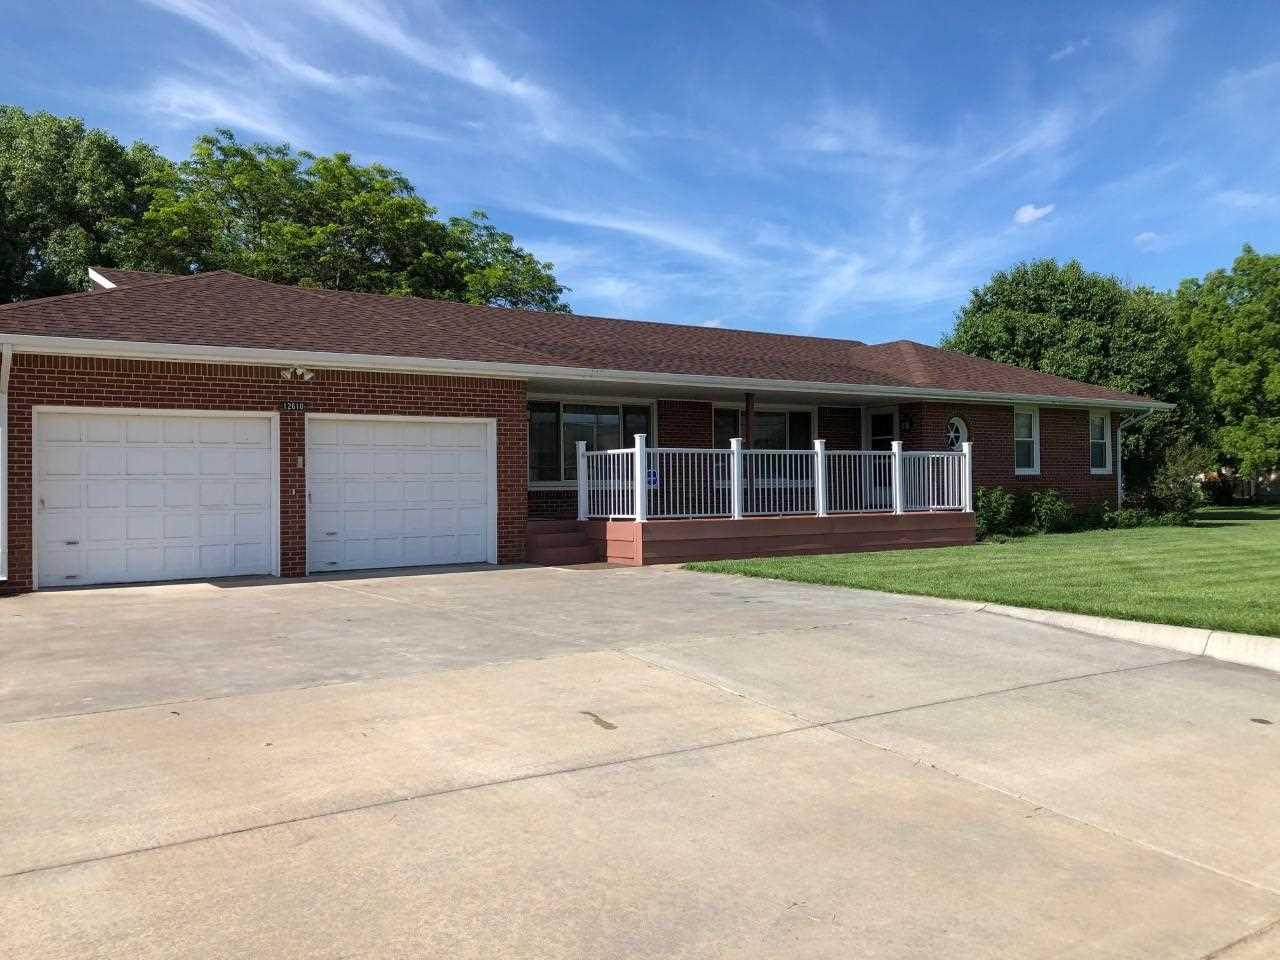 12610 W Central Ave, Wichita, KS, 67235